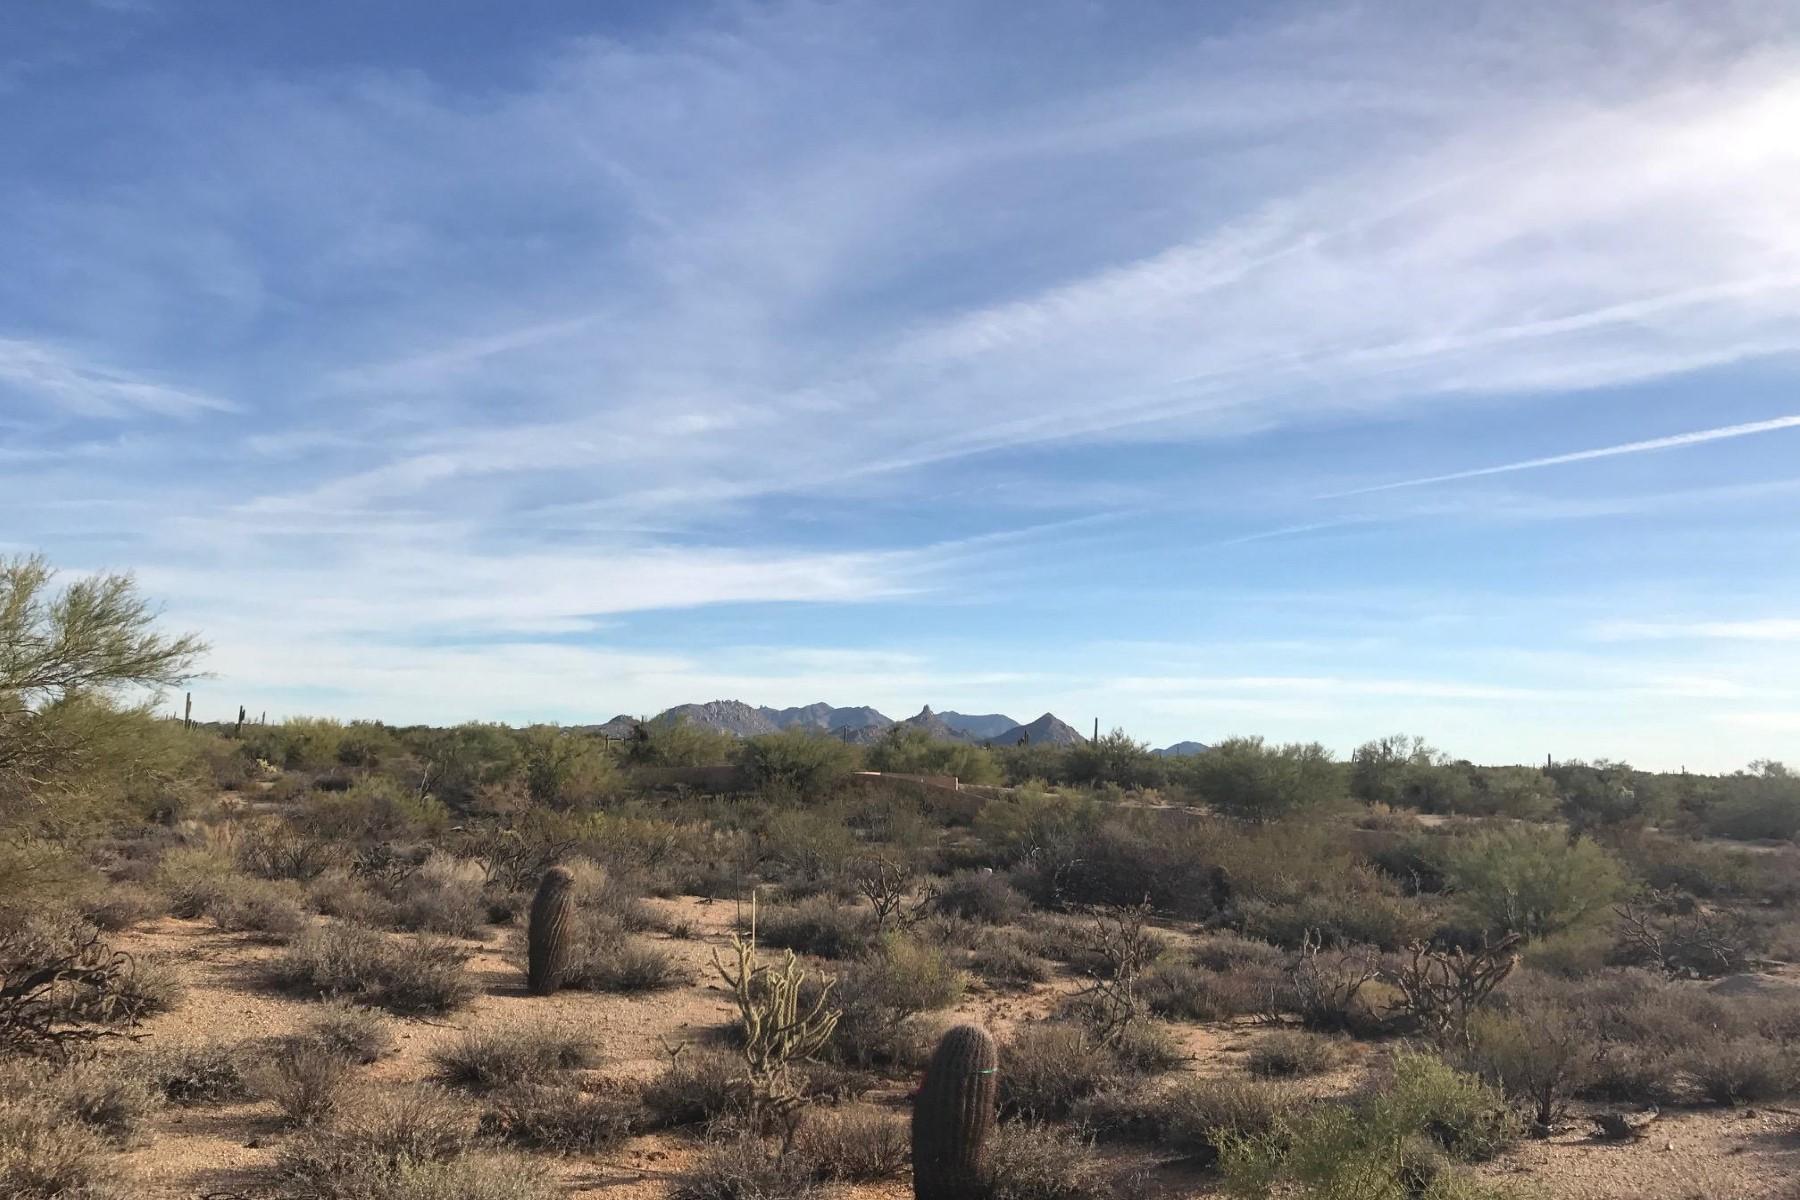 Terreno para Venda às Beautiful estate size home site in the gated community of Whisper Rock 8299 E Whisper Rock Trl 80 Scottsdale, Arizona, 85266 Estados Unidos